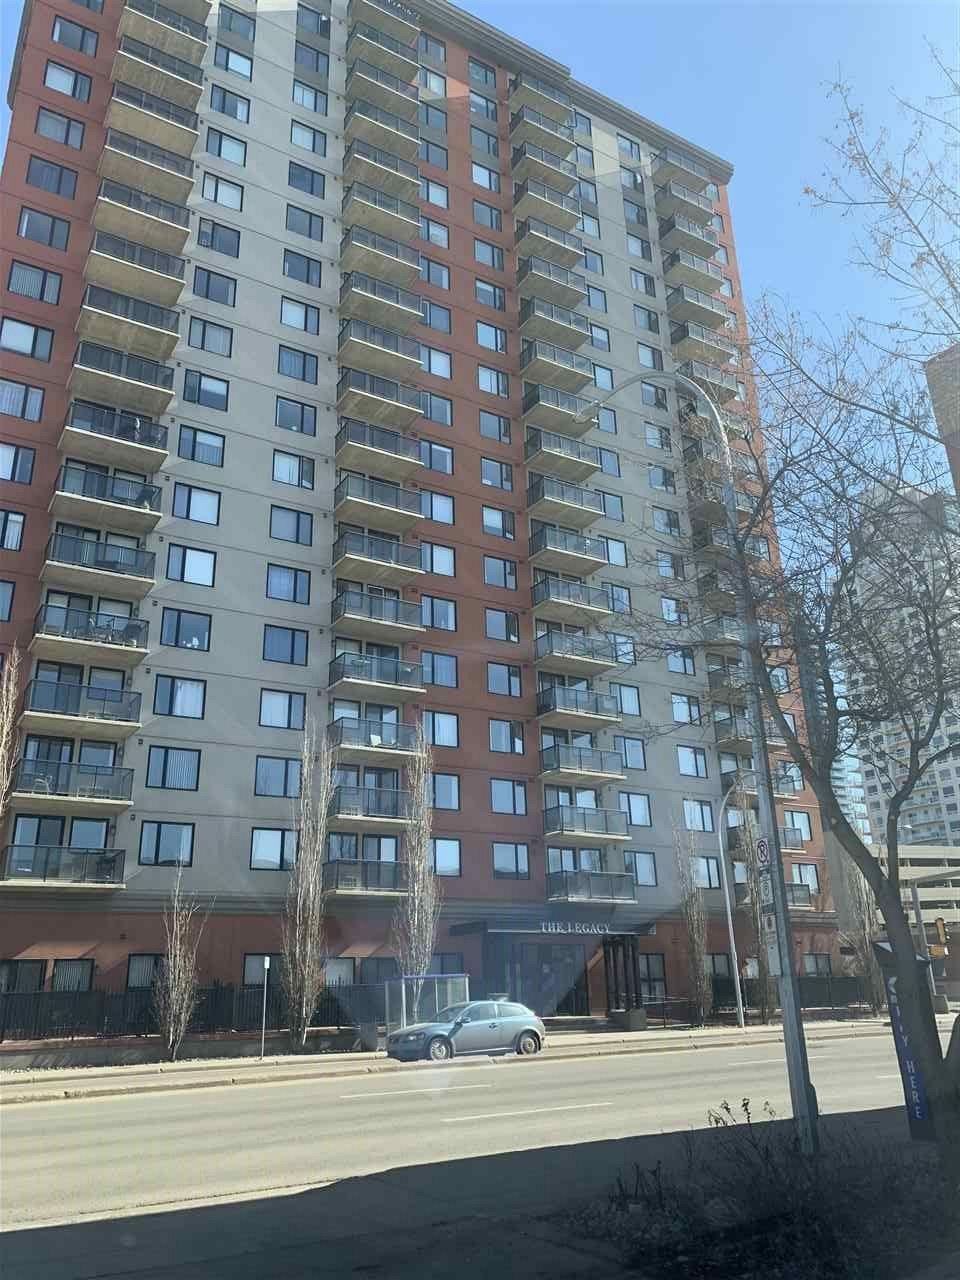 Main Photo: 1801 10303 105 Street NW in Edmonton: Zone 12 Condo for sale : MLS®# E4233635